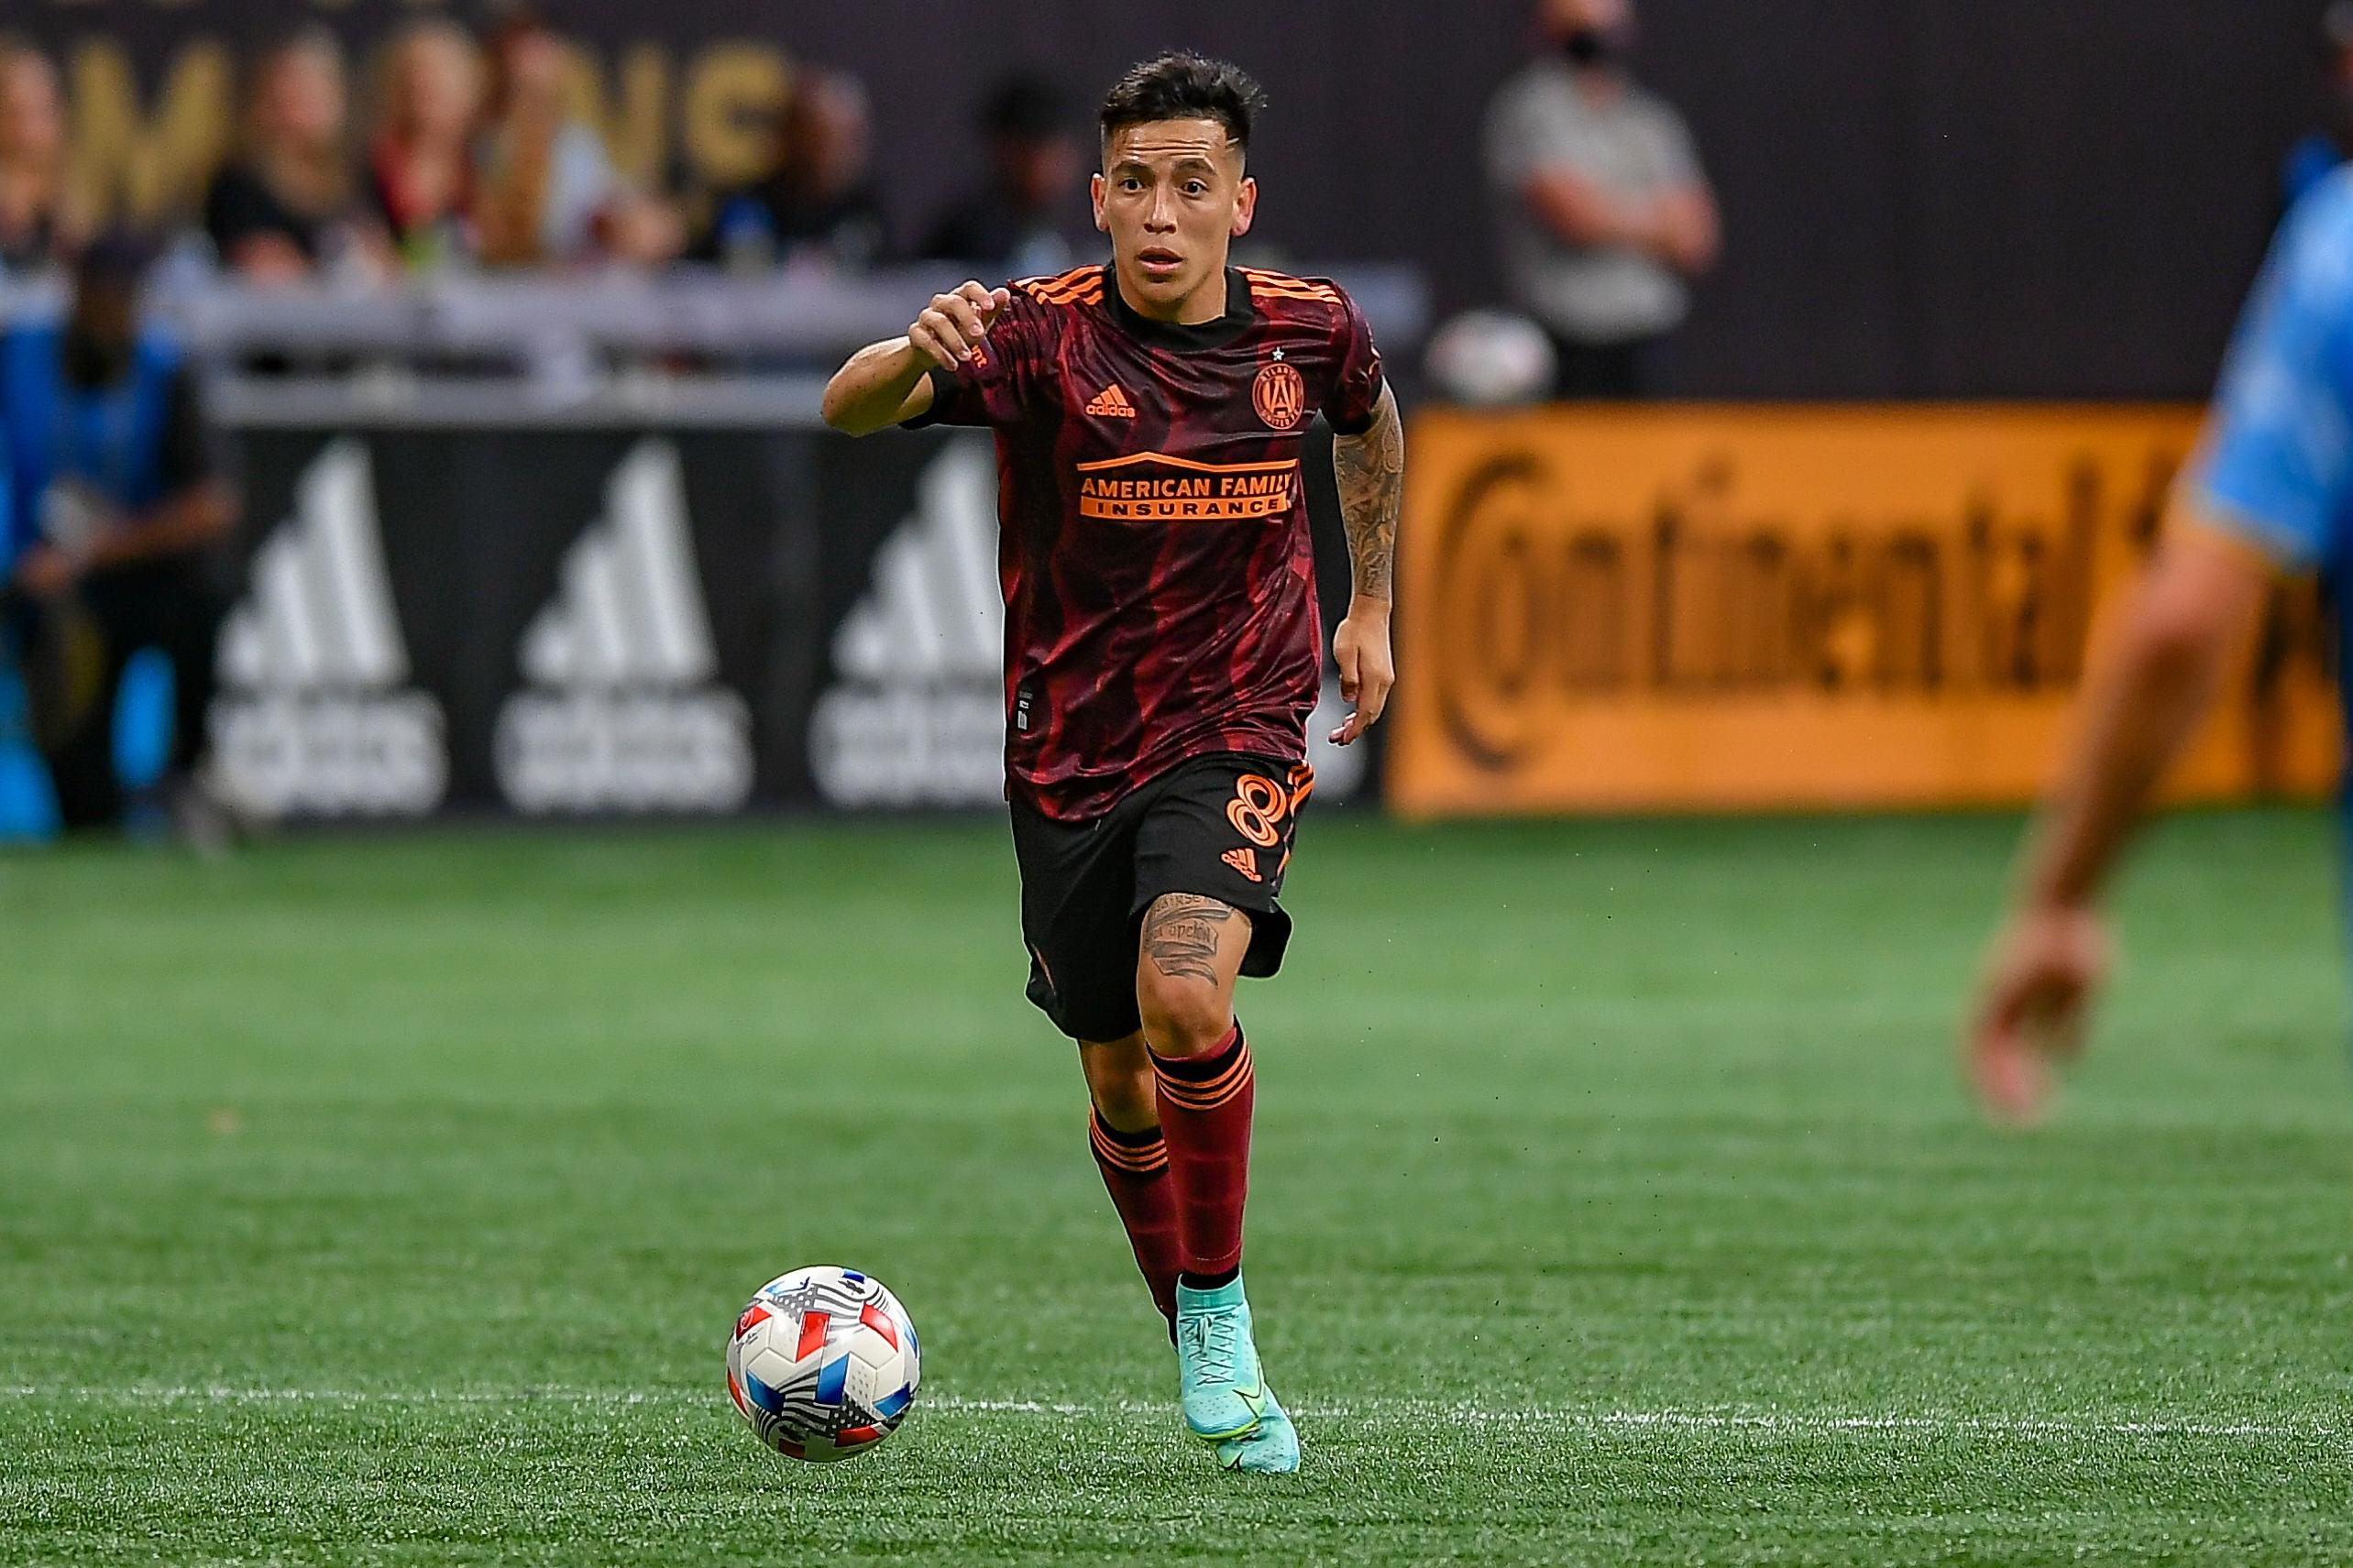 SOCCER: JUN 20 MLS - Philadelphia Union at Atlanta United FC